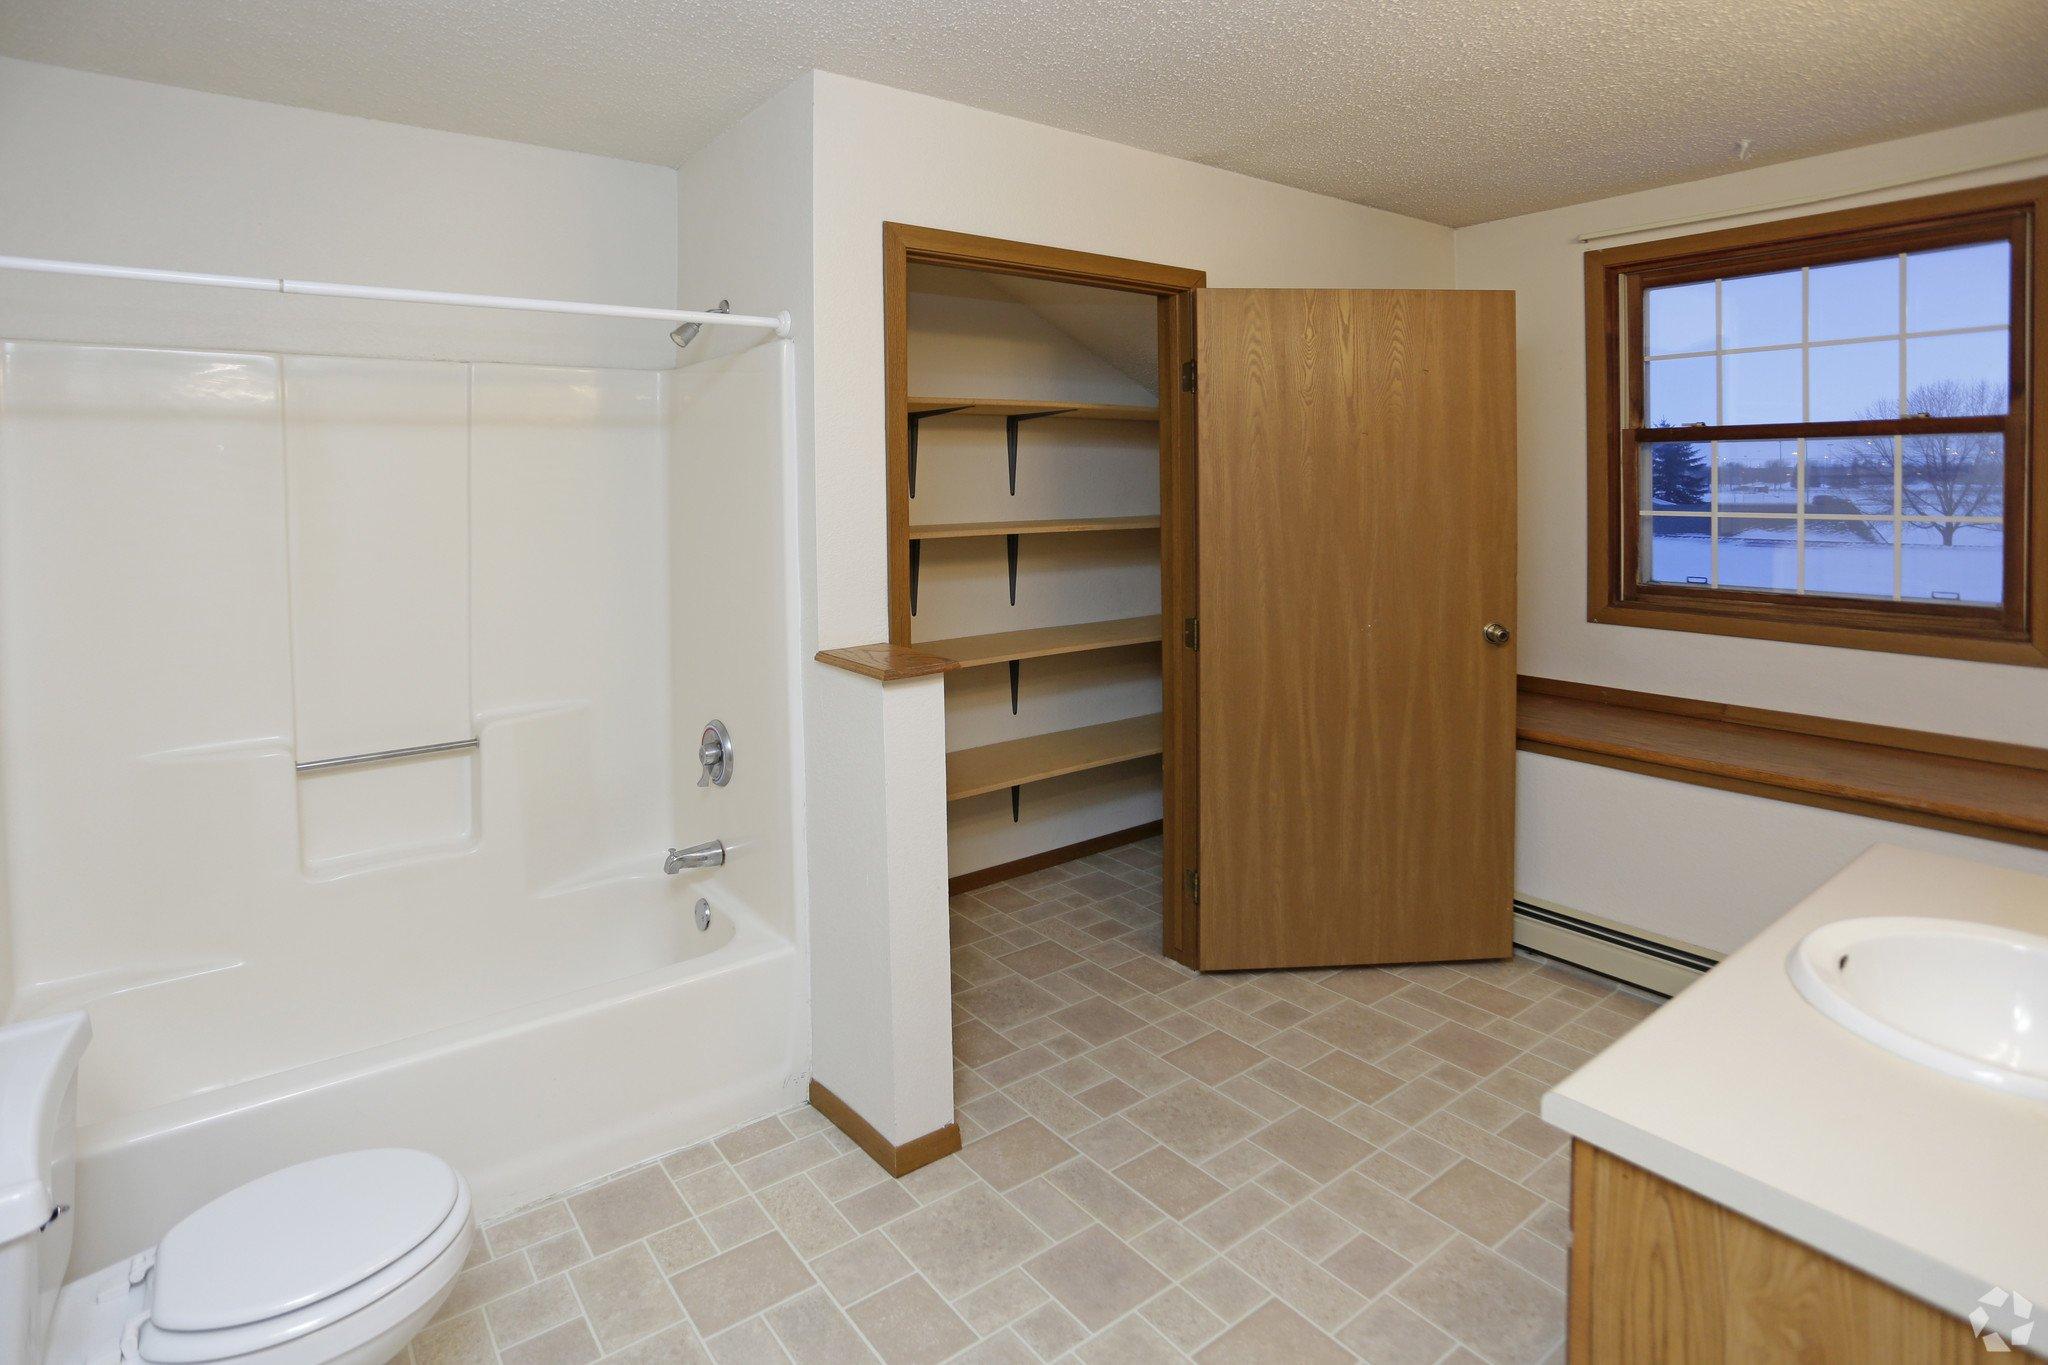 Carrington court townhouse apartments grand forks nd 2 - 2 bedroom apartments grand forks nd ...